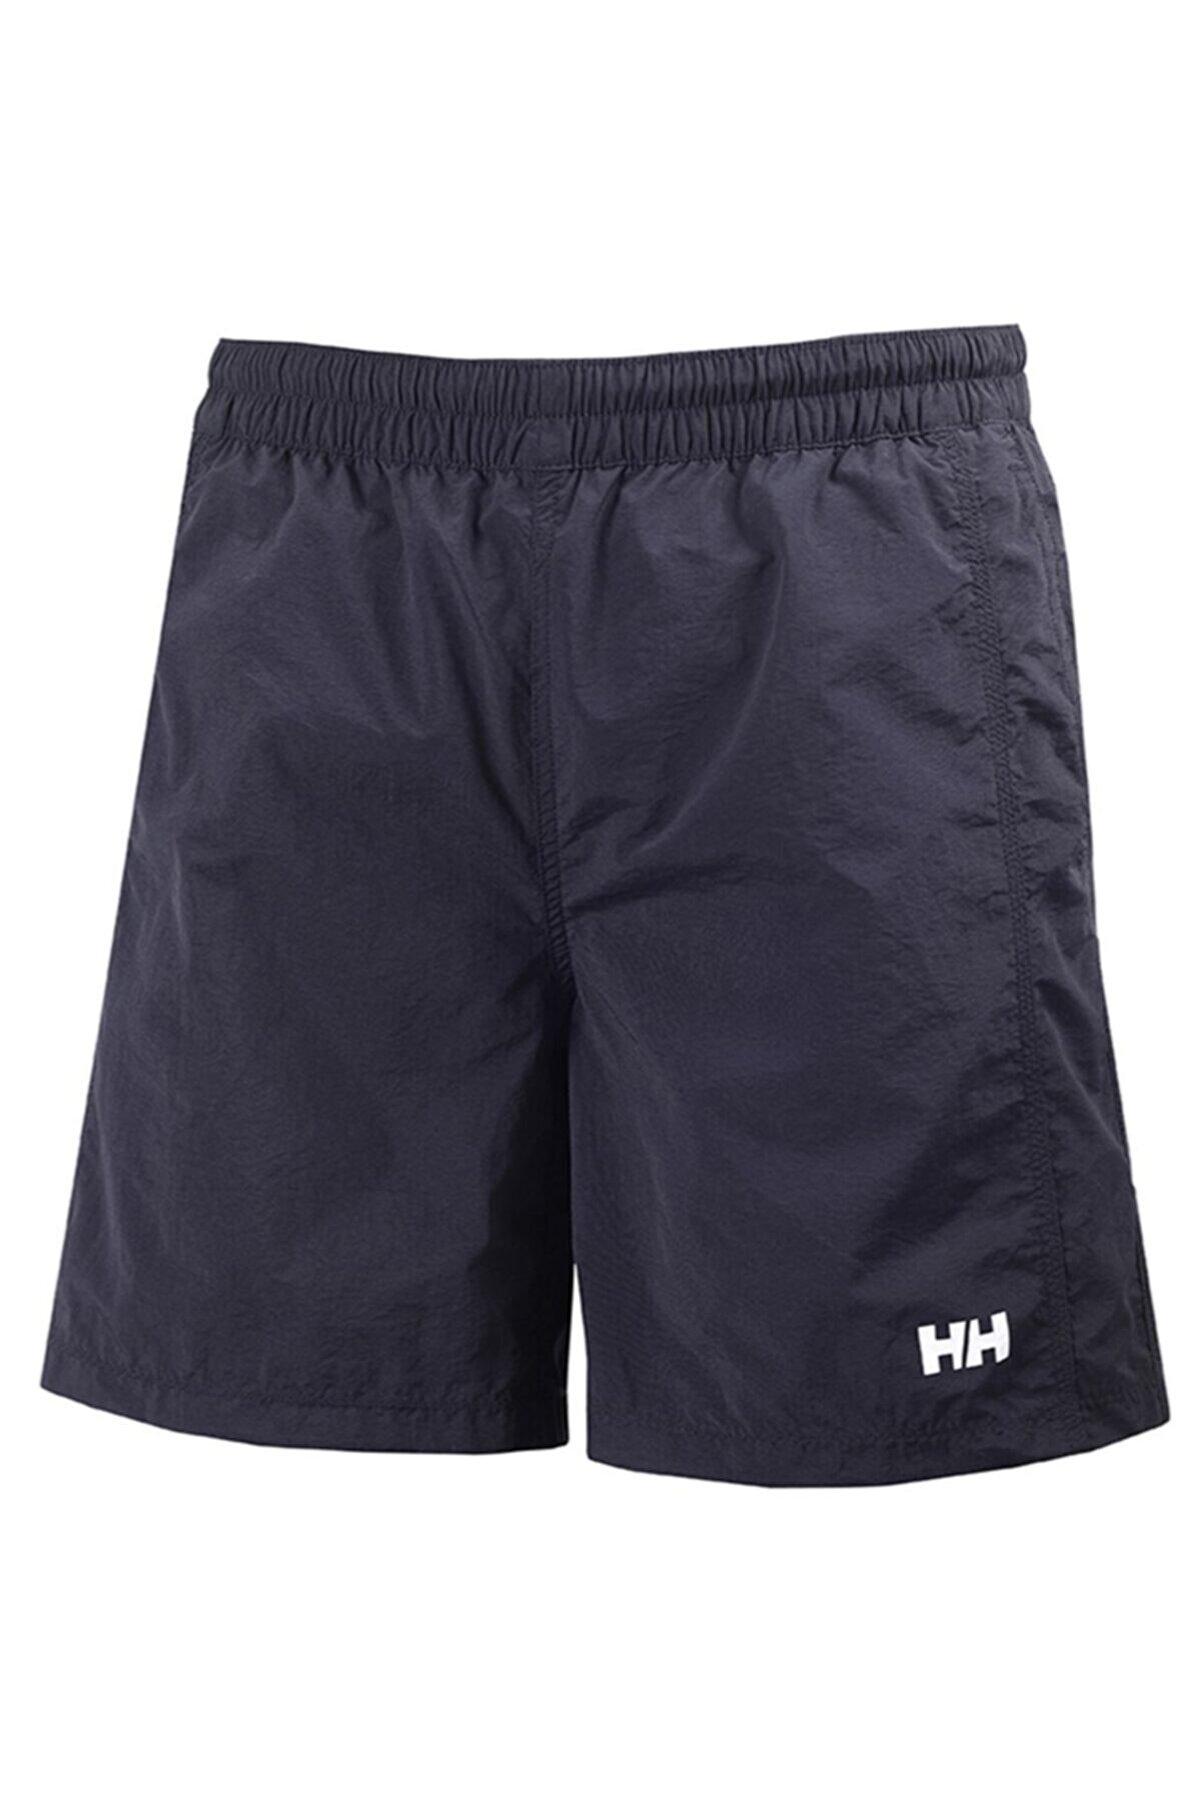 Helly Hansen Carlshot Swim Trunk Erkek Şort Navy